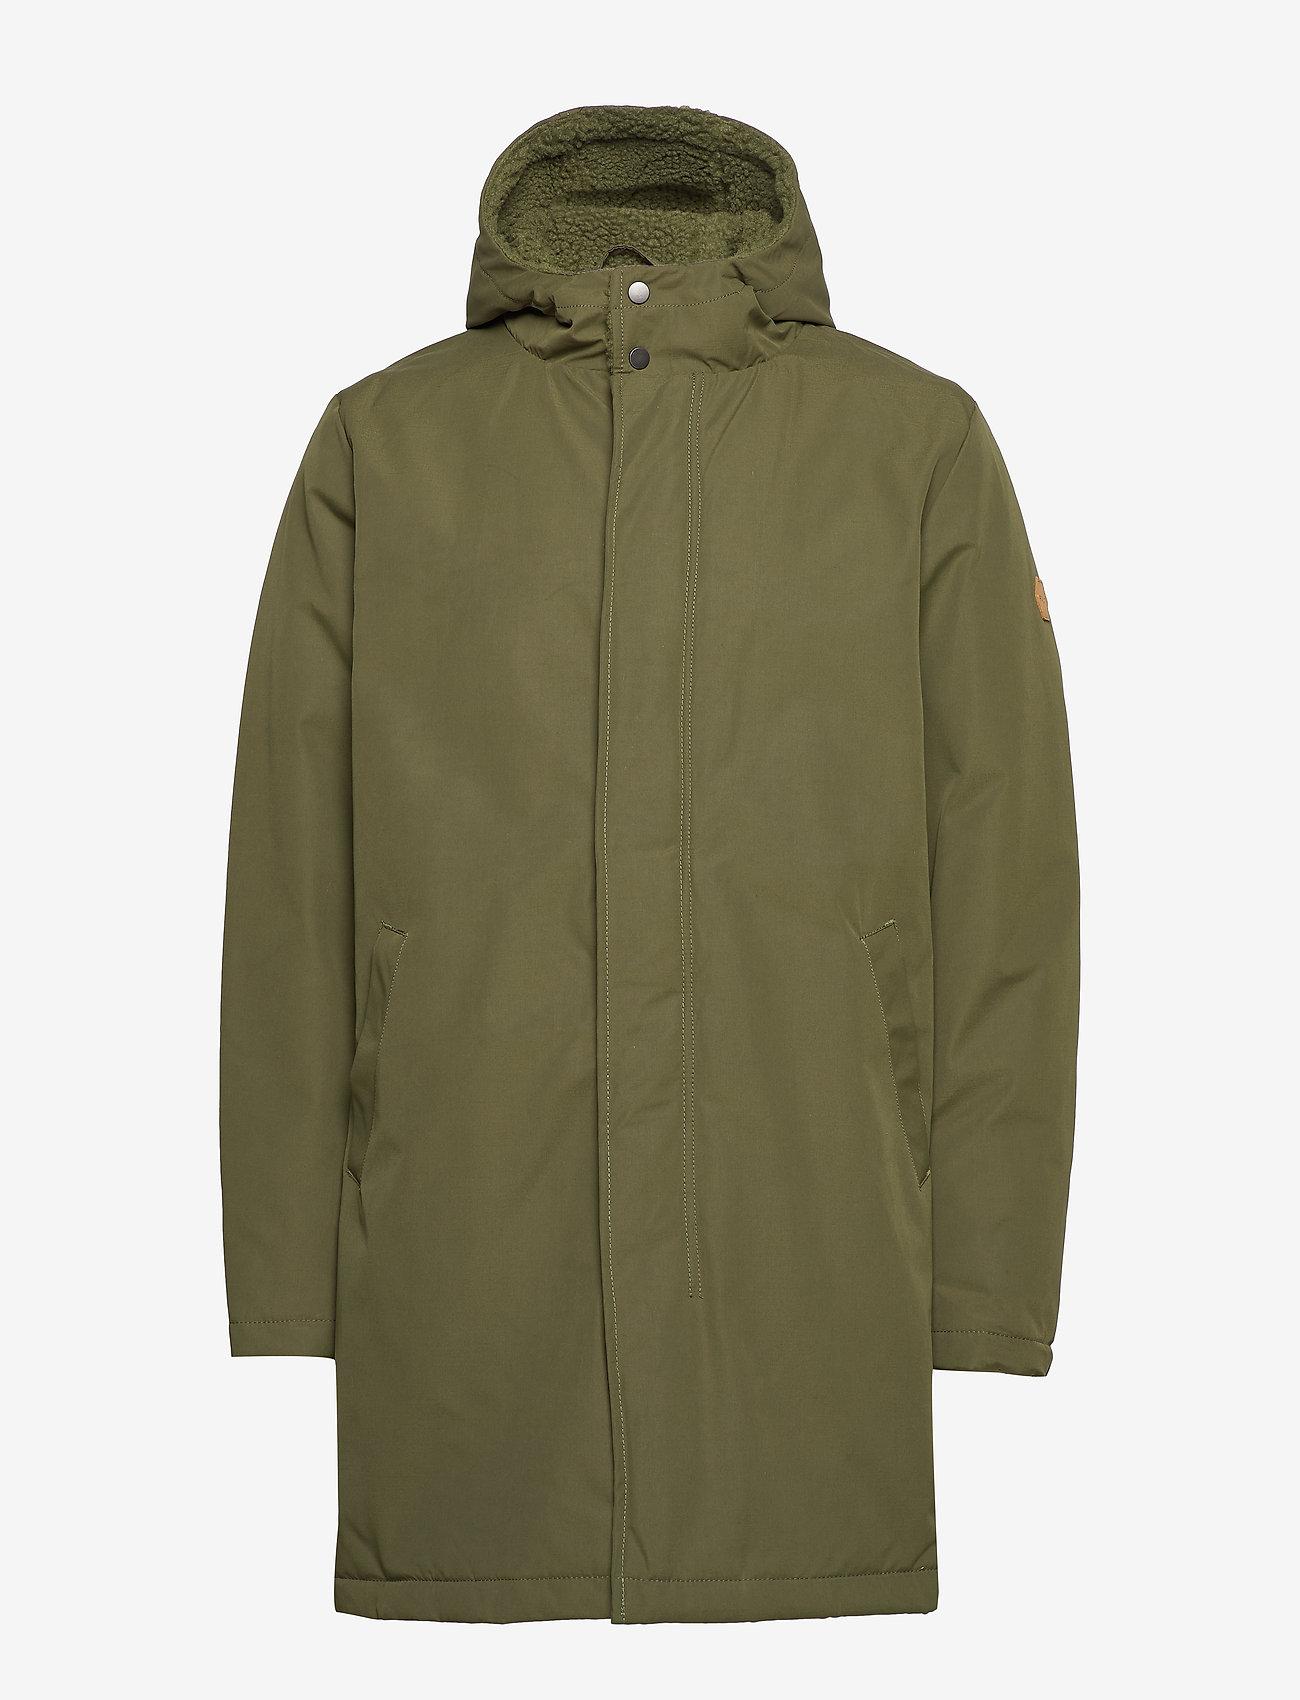 Rvlt Parka Jacket - Jackets & Coats